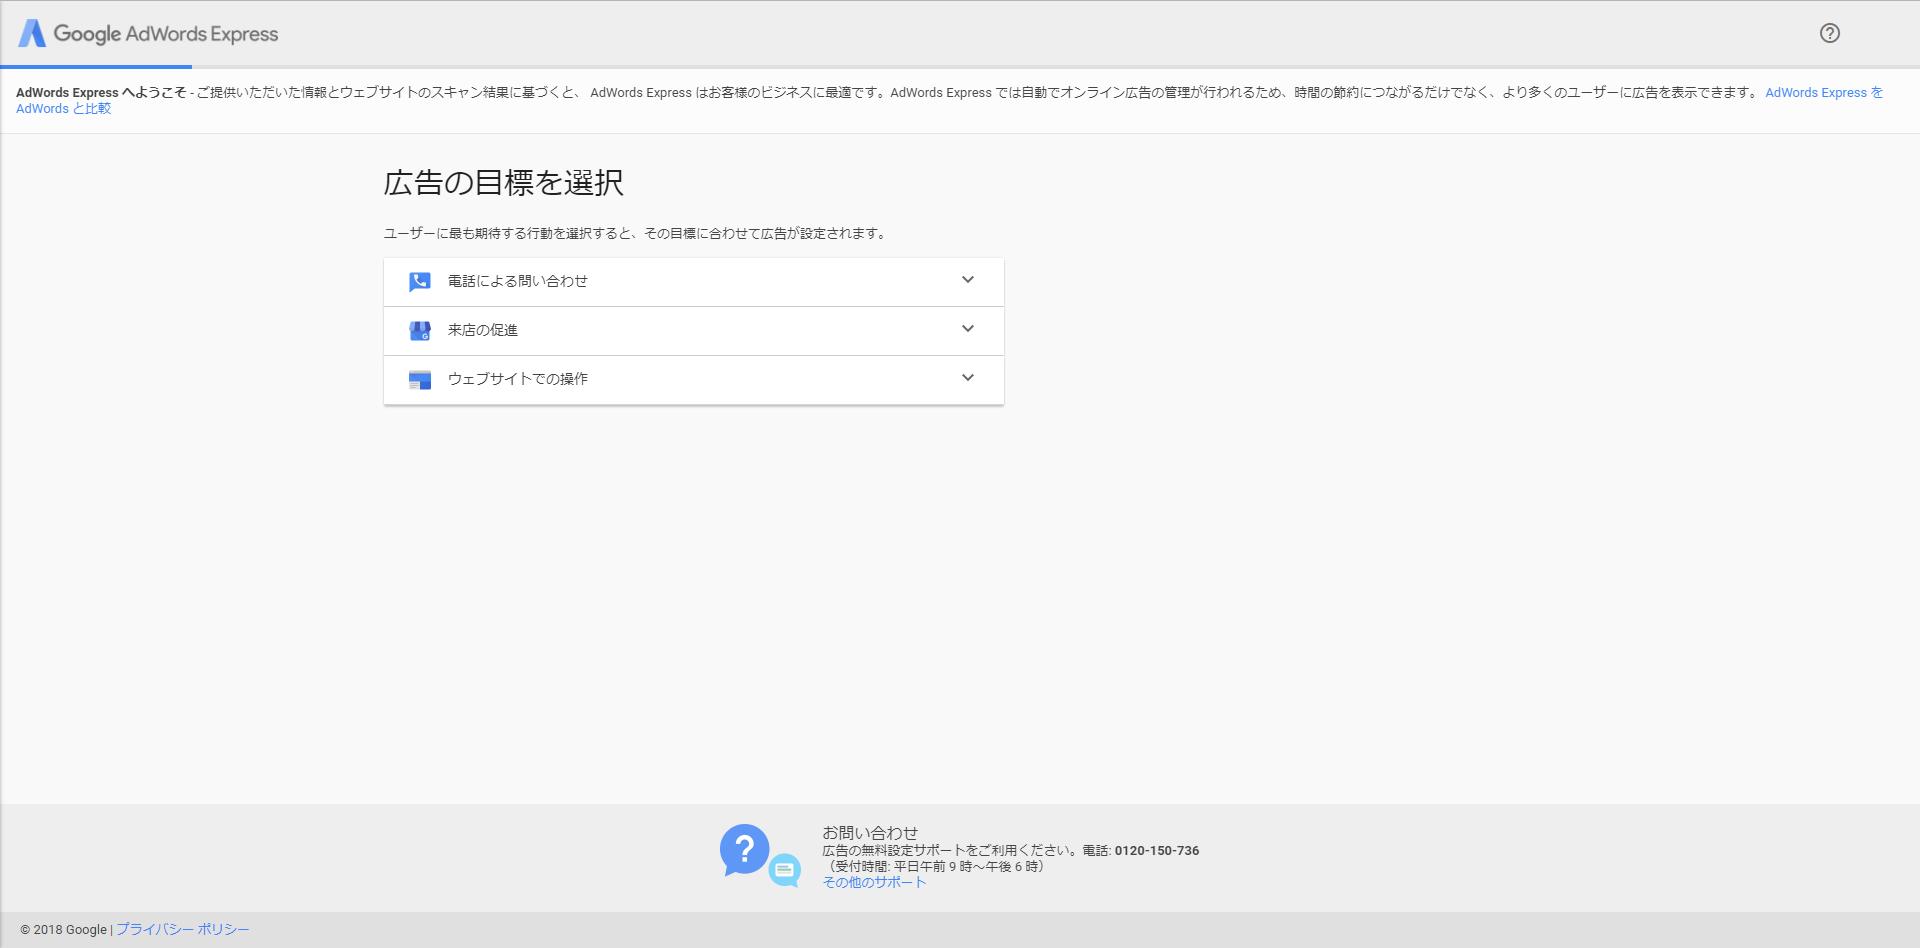 Google広告 Expressの画面